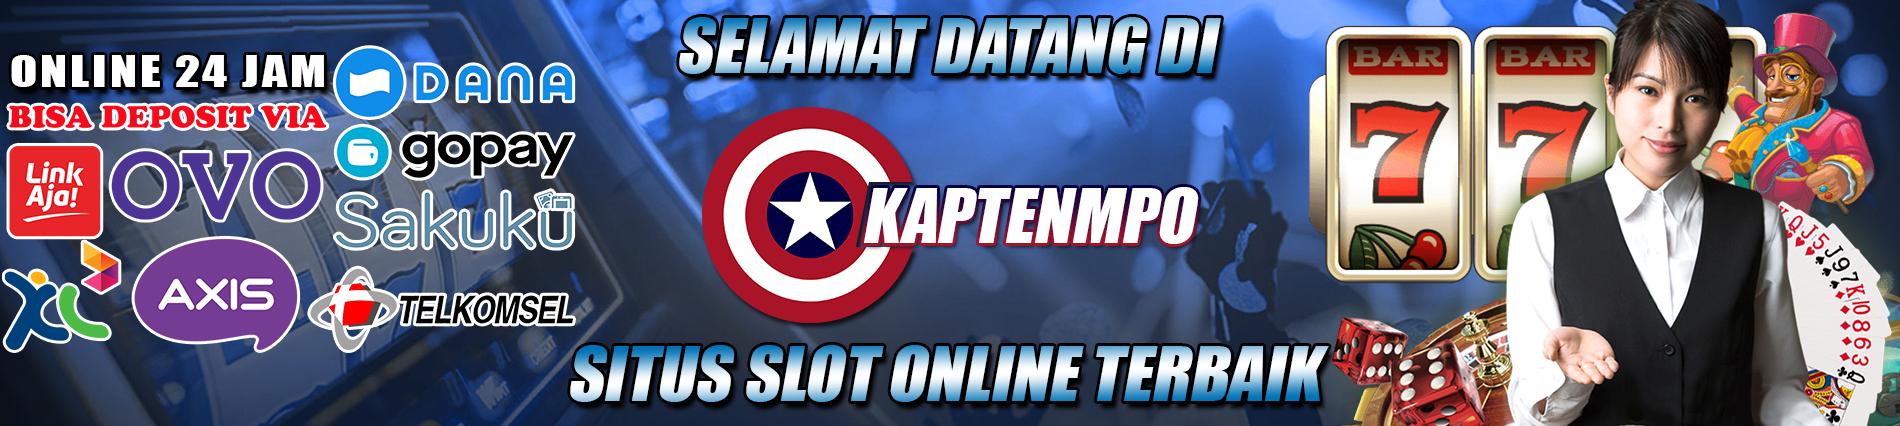 Banner Judi kaptenmpo